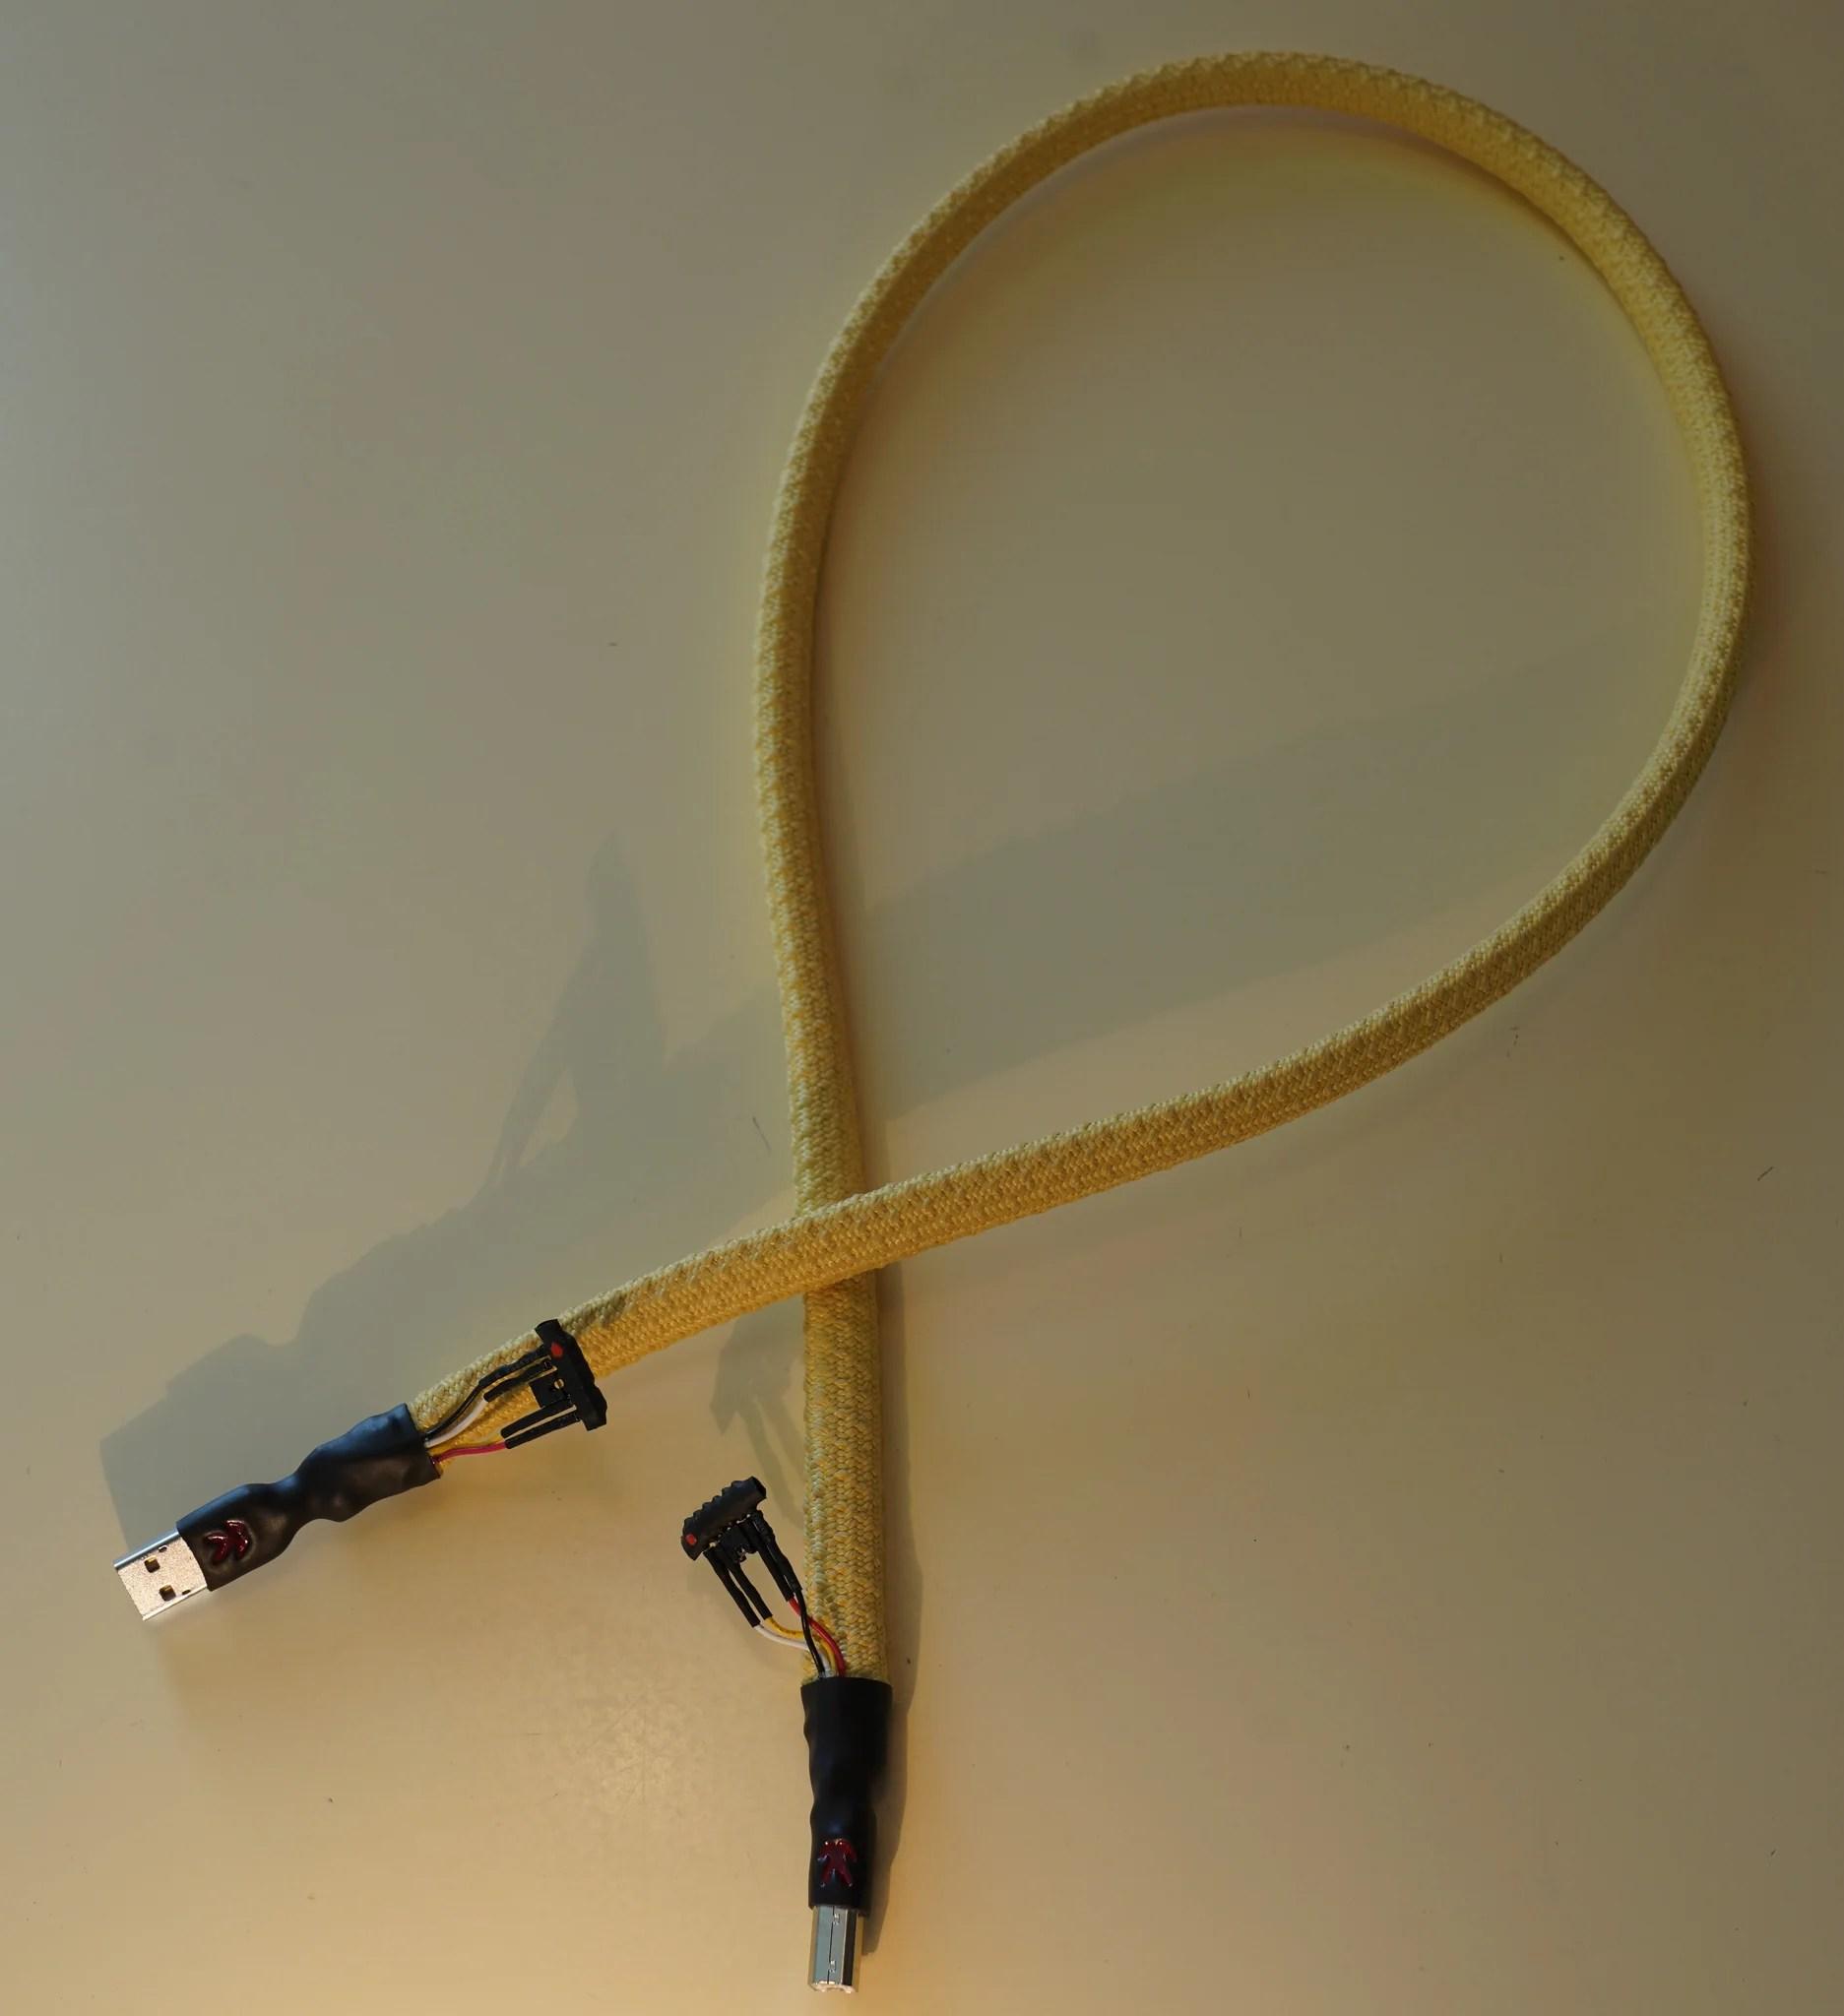 medium resolution of lush 2 usb audio cable